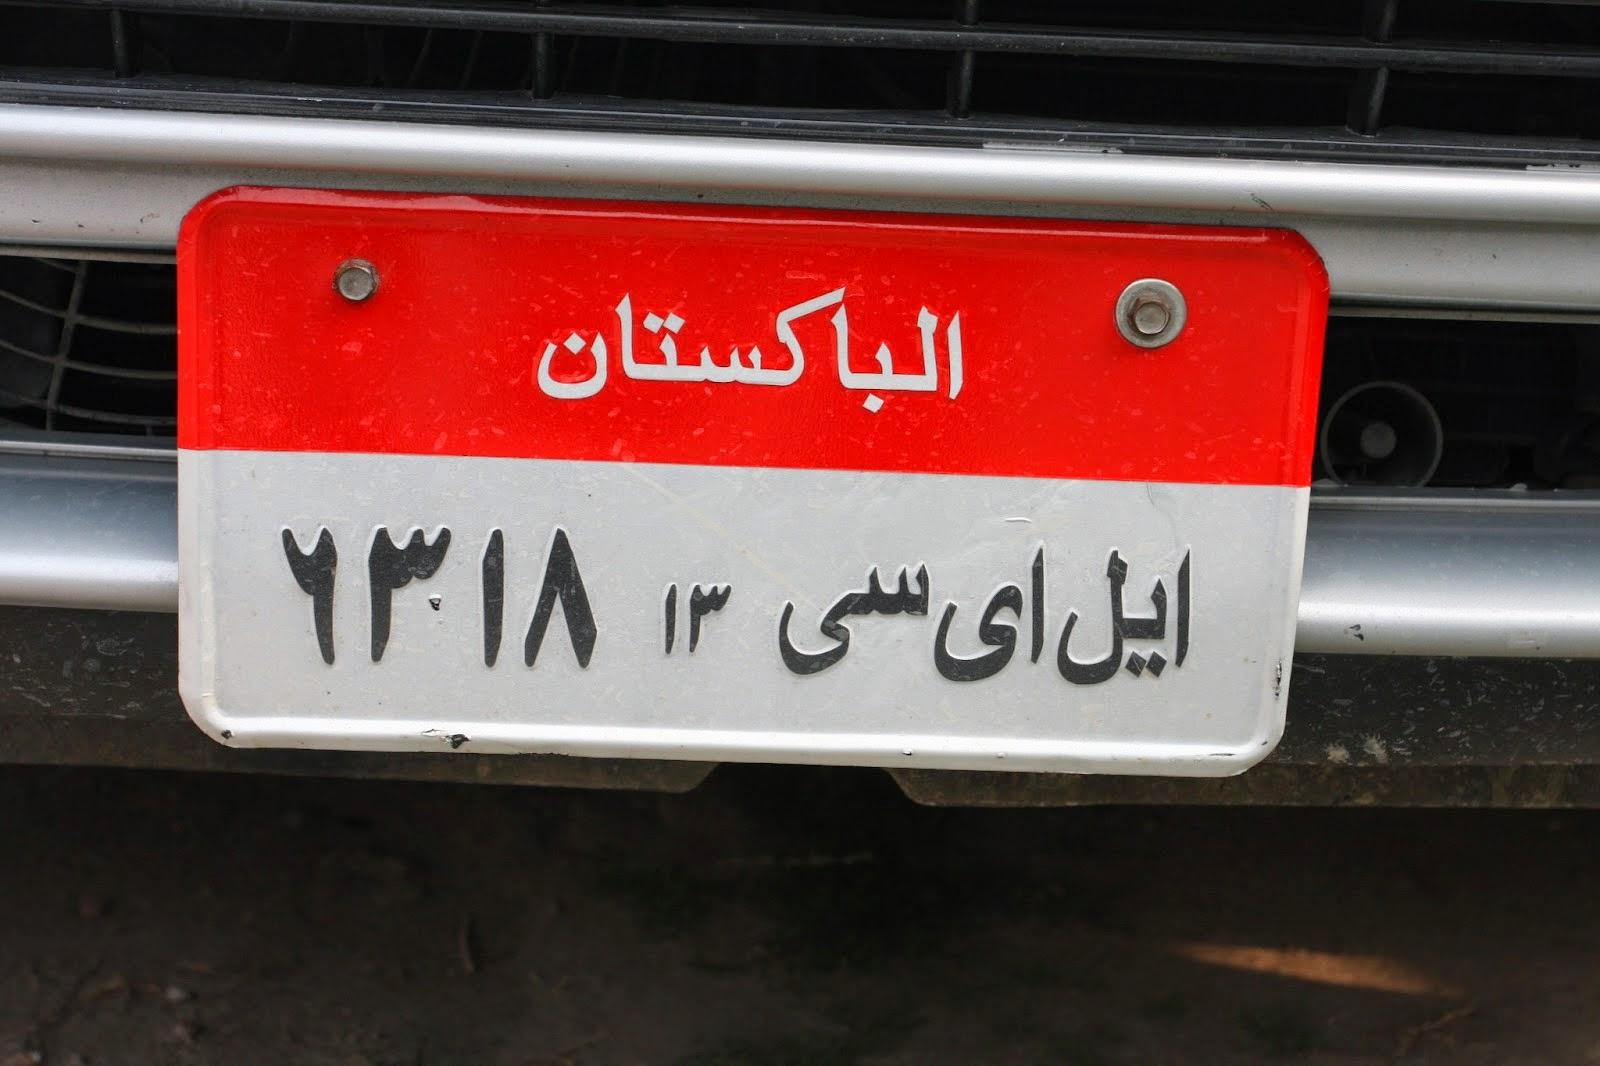 Al-Bakistan, Al-Bunjab, Asia, Cars Number Plates, Dubai, Excise Department, News, Number Plate Trend, Number Plates, Pakistan, Punjab, Saudi Arabia, Vehicles,